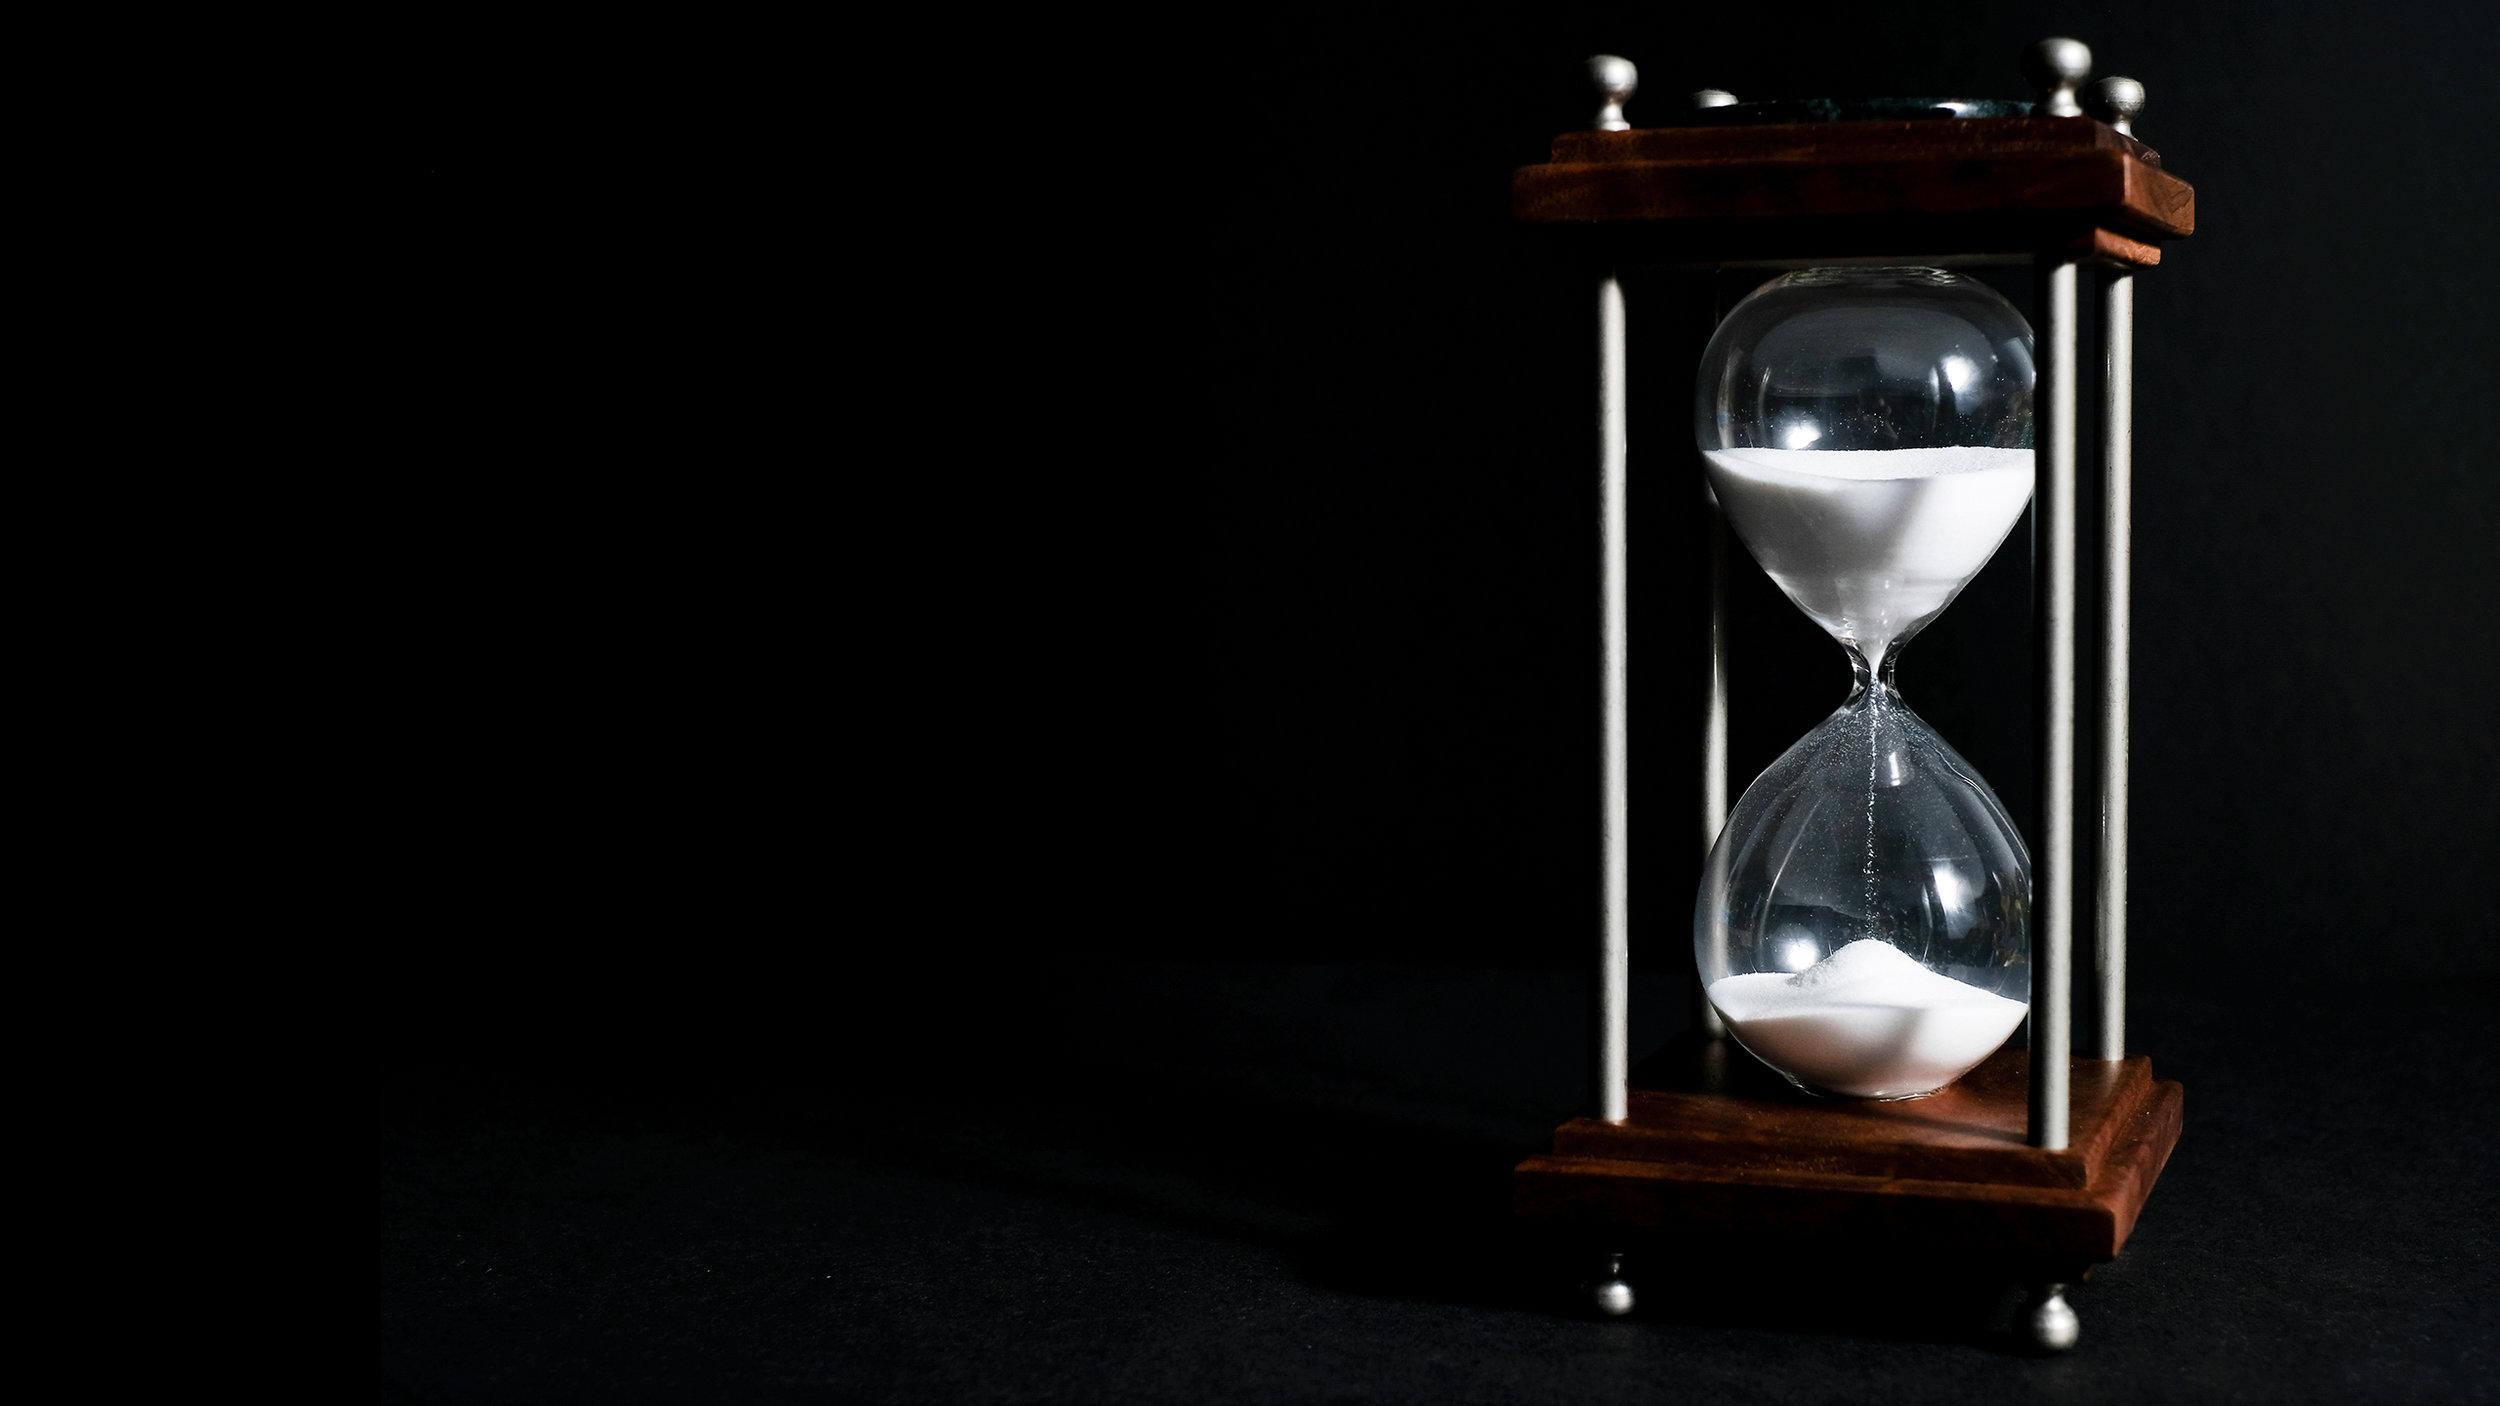 BRENDOVI     Pitanje:  Koliko Je Sati?  Odgovor:  Sada.